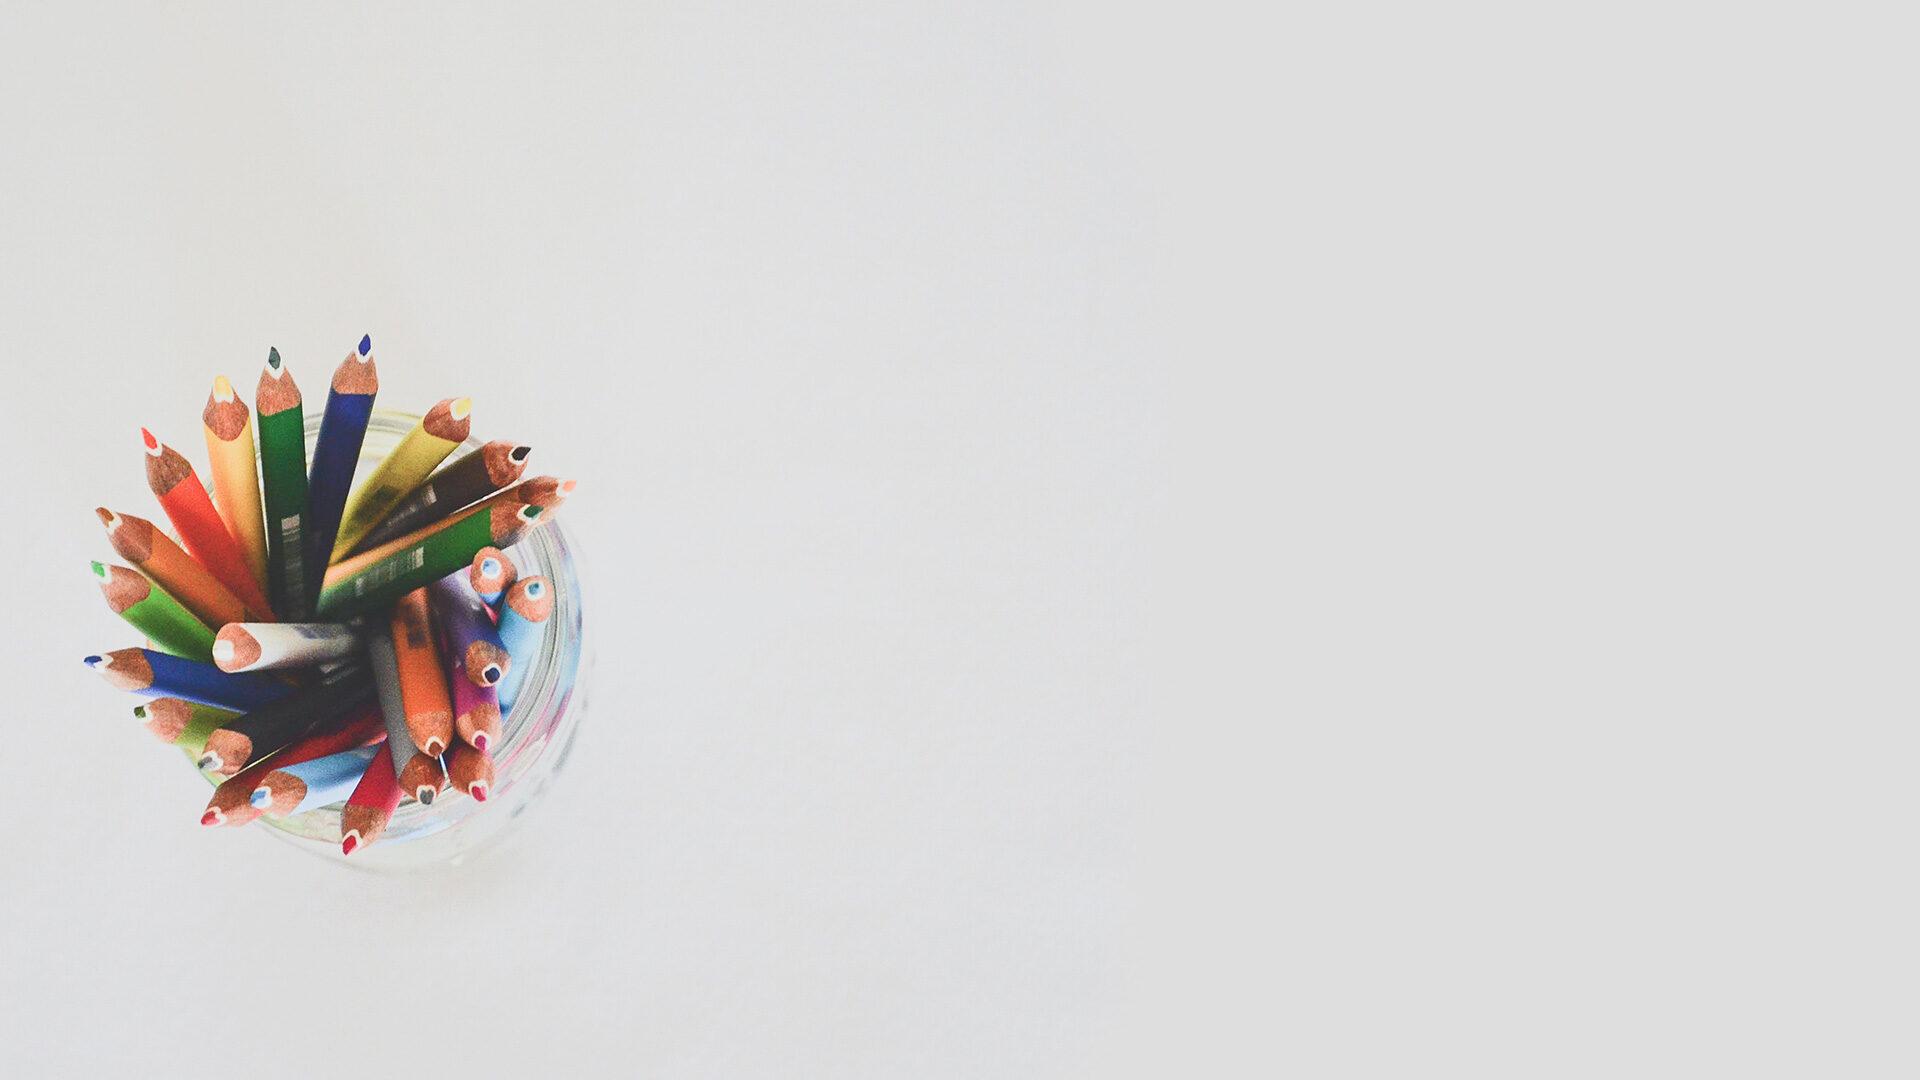 colorful pencil backgorund